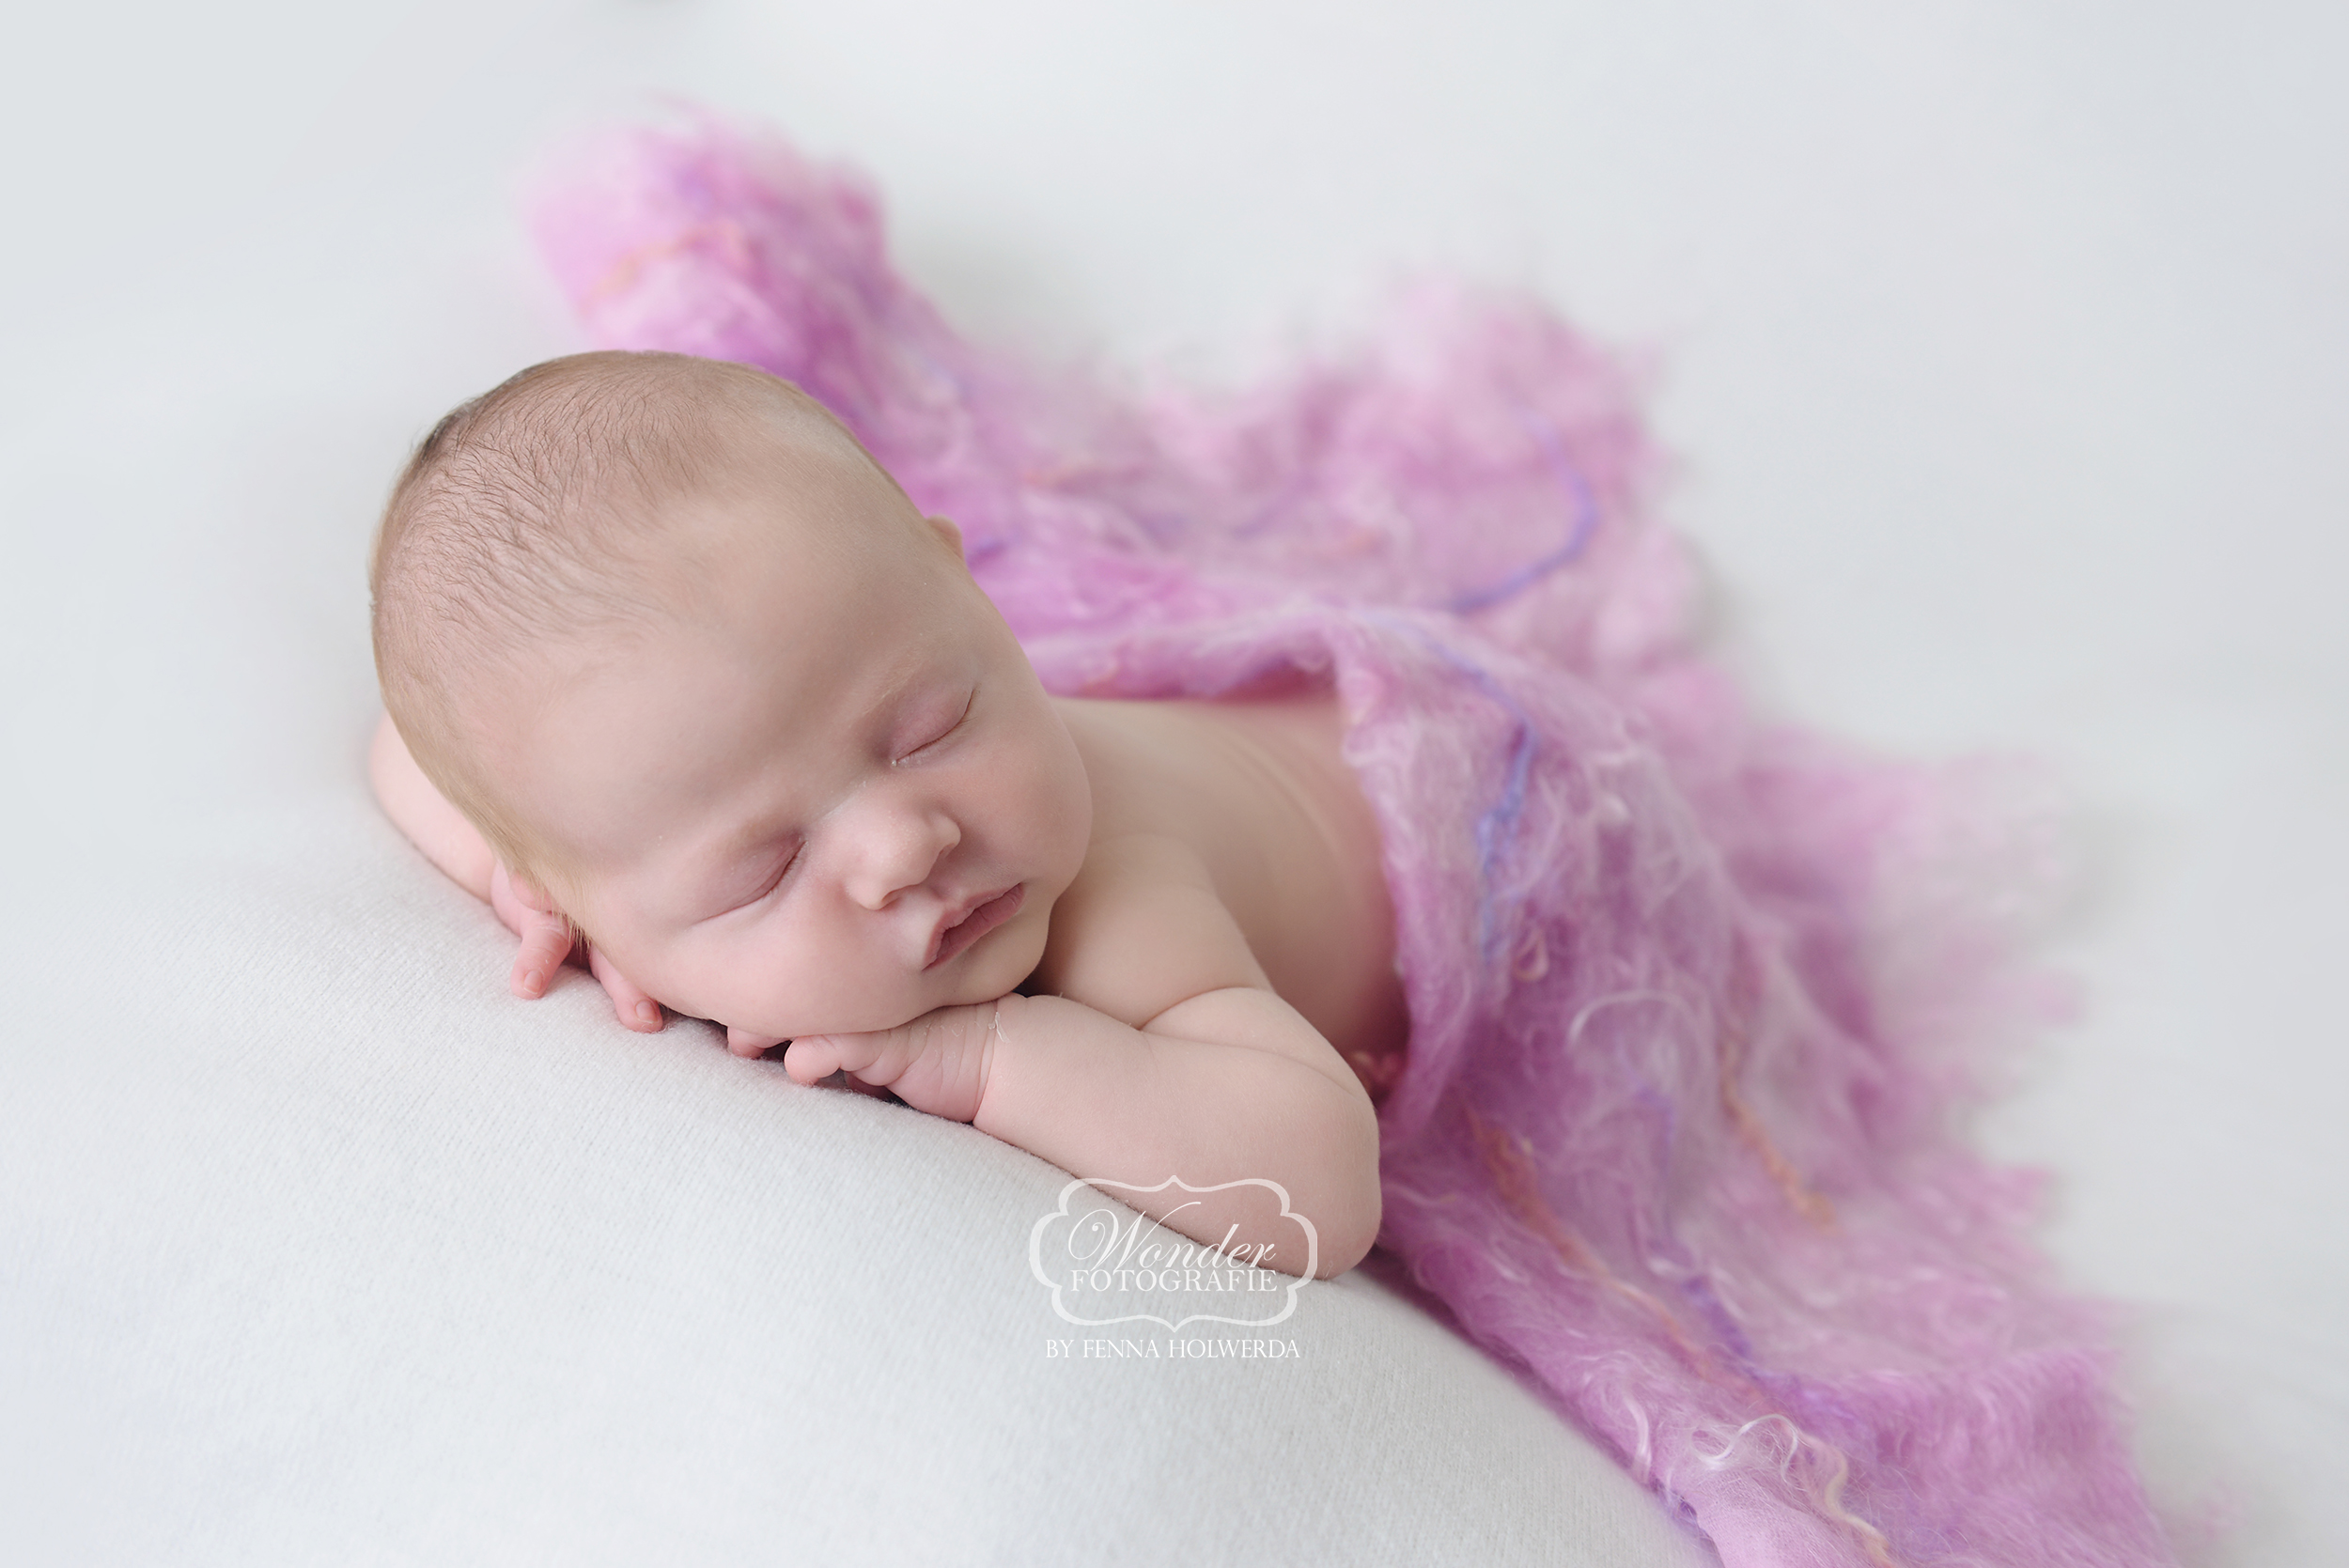 newborn fotoshoot puur naturel mooitse beste baby photoshoot shoot gooi 2